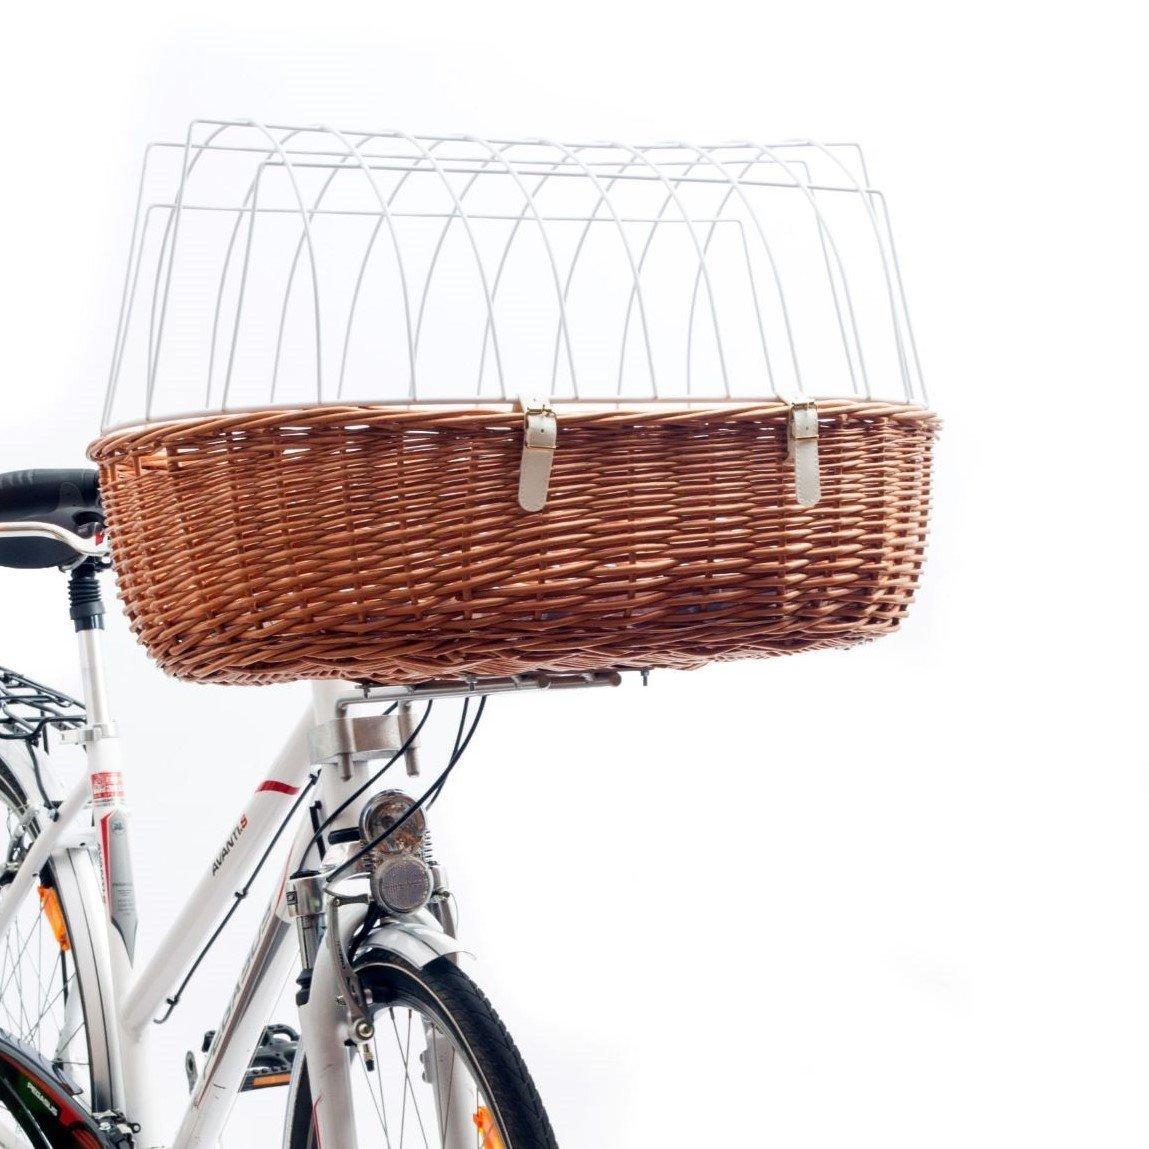 Aumüller Hunde Fahrradkorb hoch für E-Bike, XL: 68 x 46 x 18/40 cm, natur